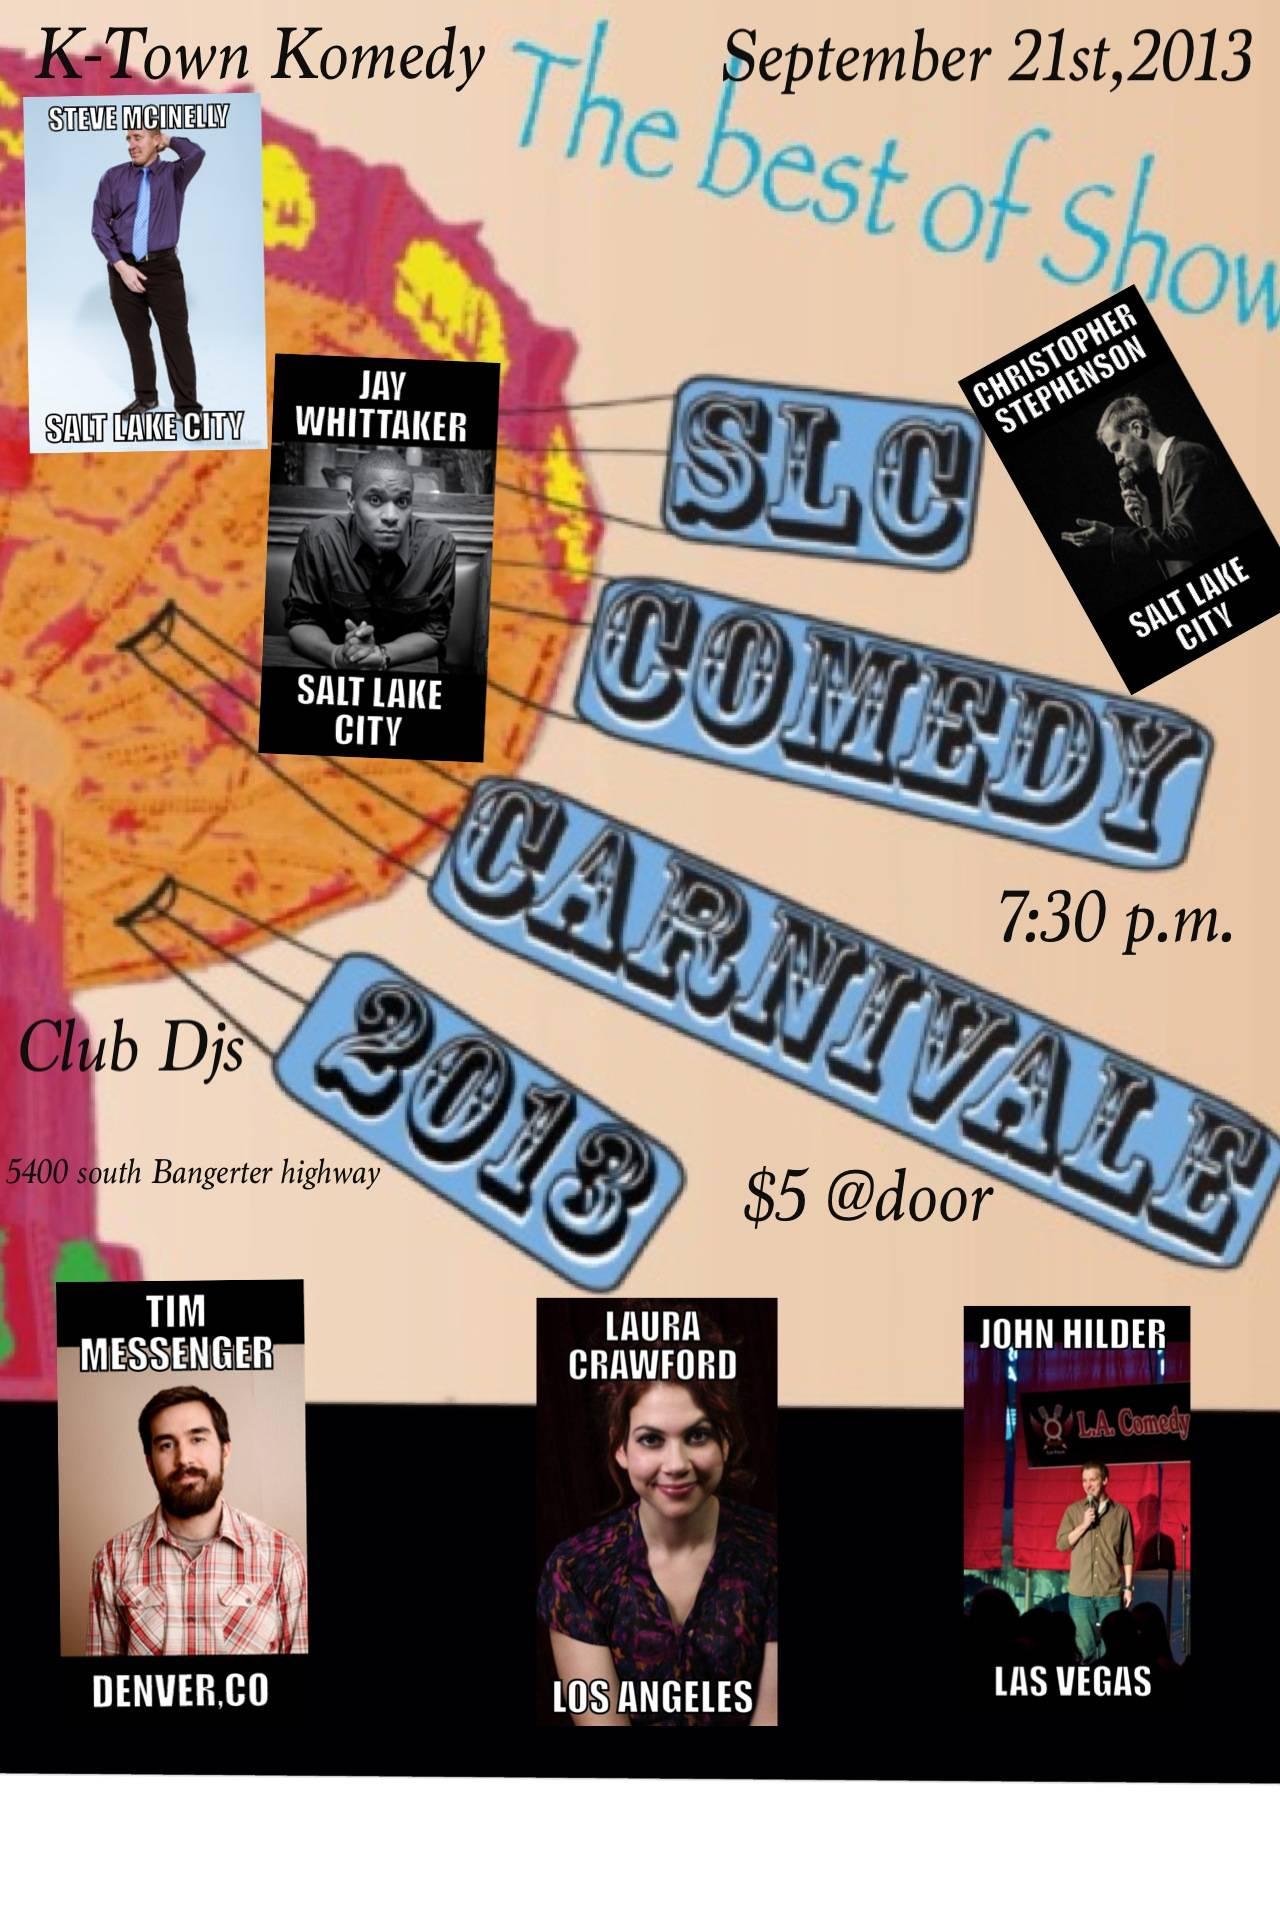 SLC Comedy Carnivale